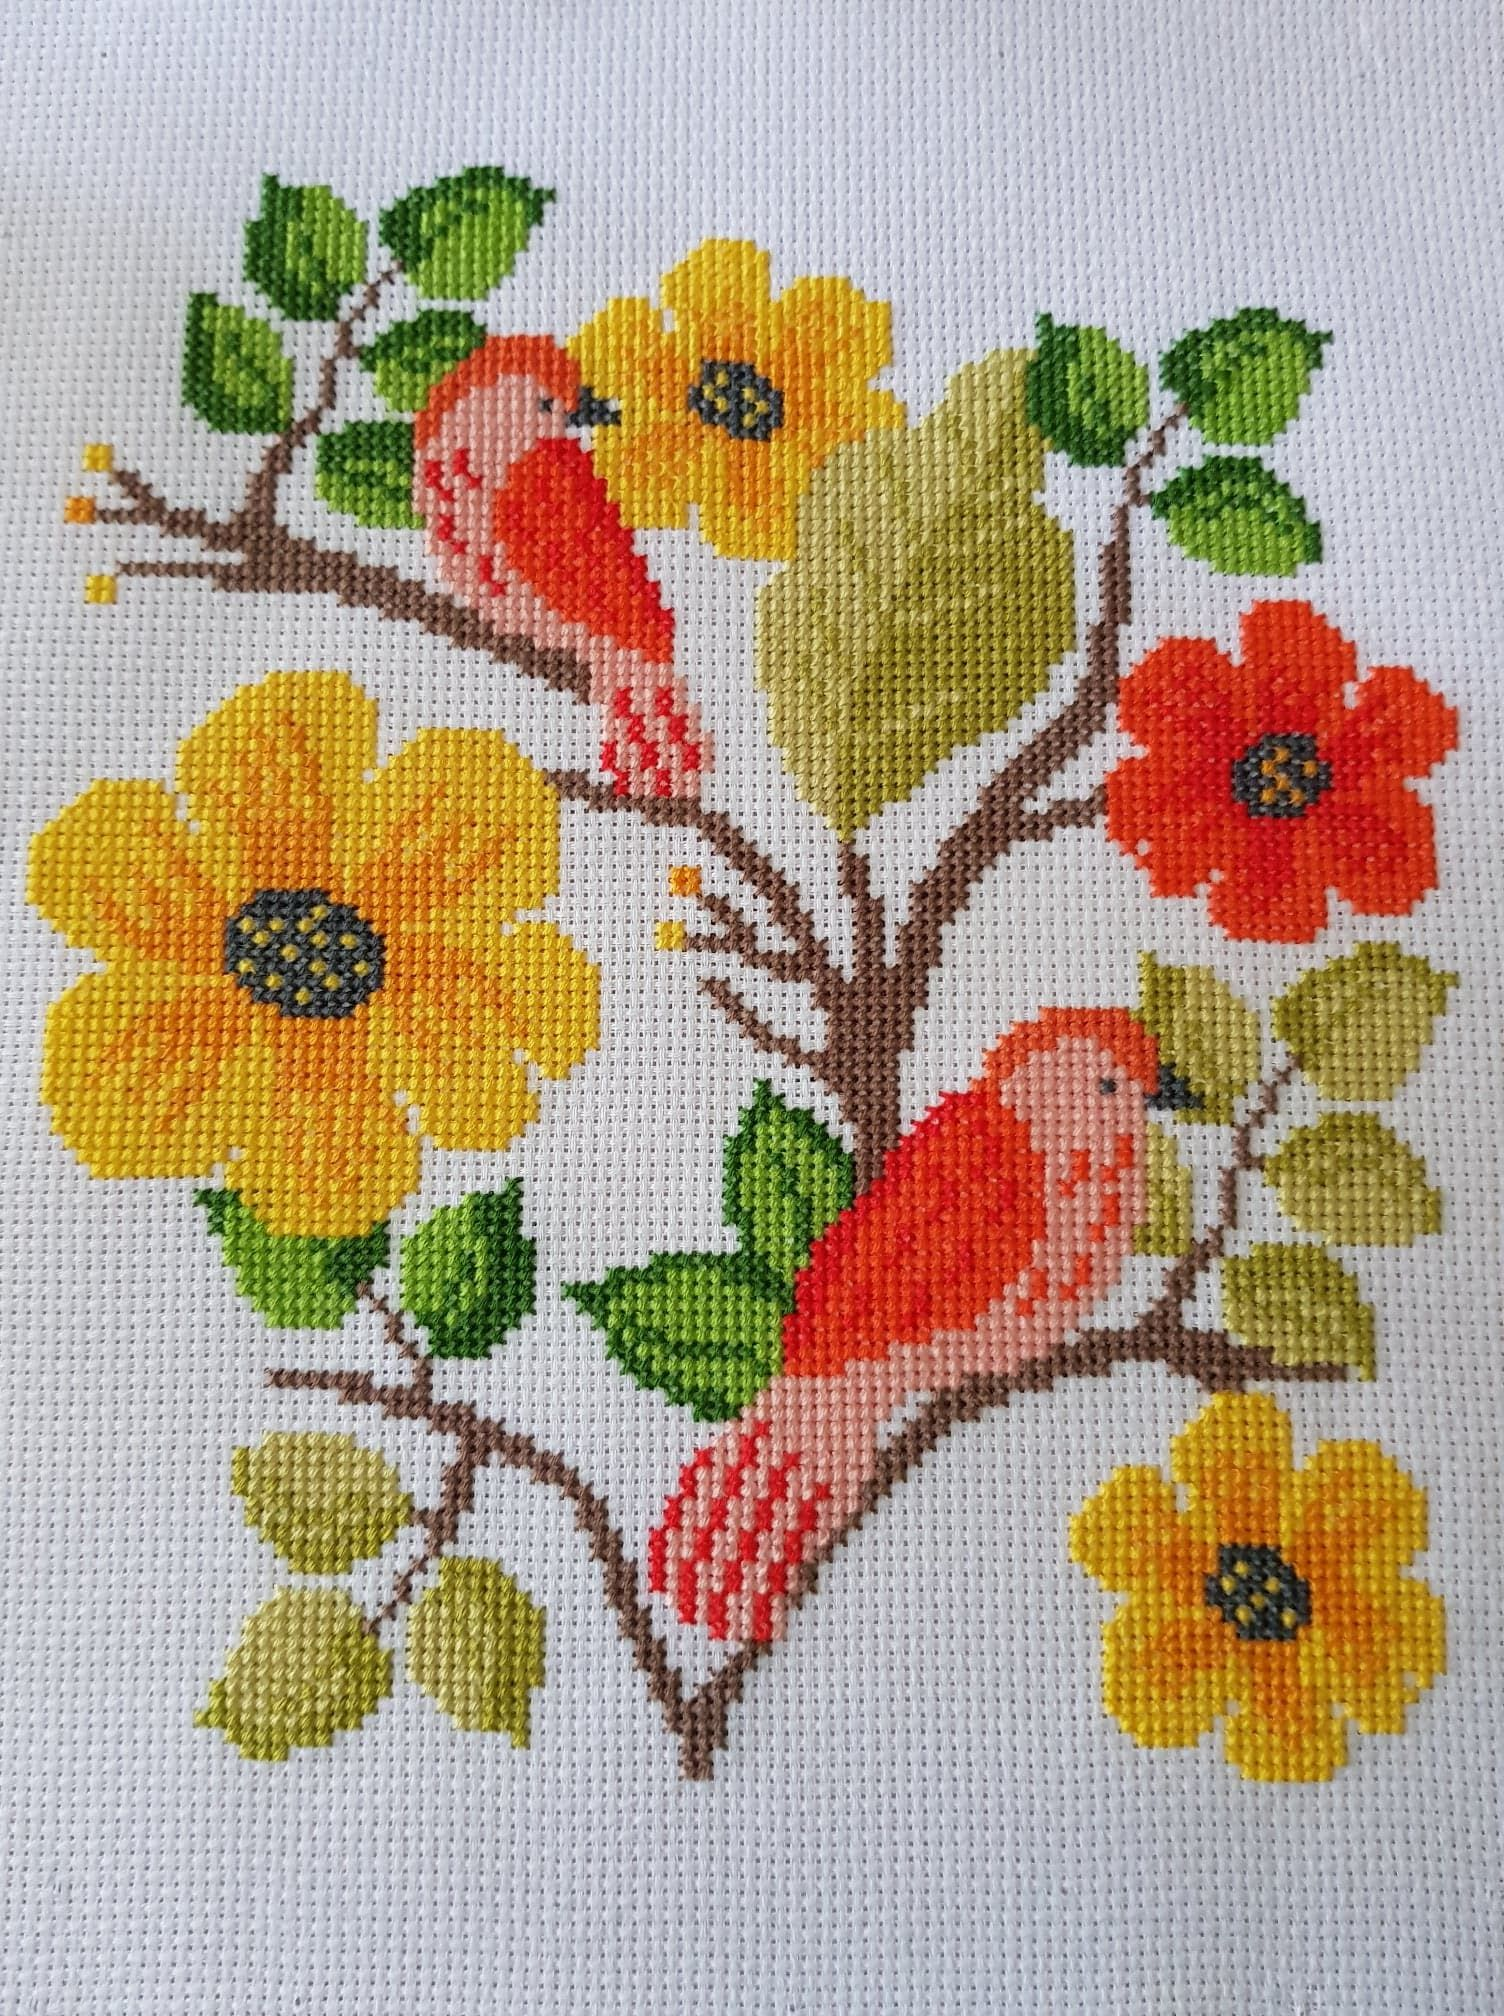 Stitched version of my cross stitch pattern